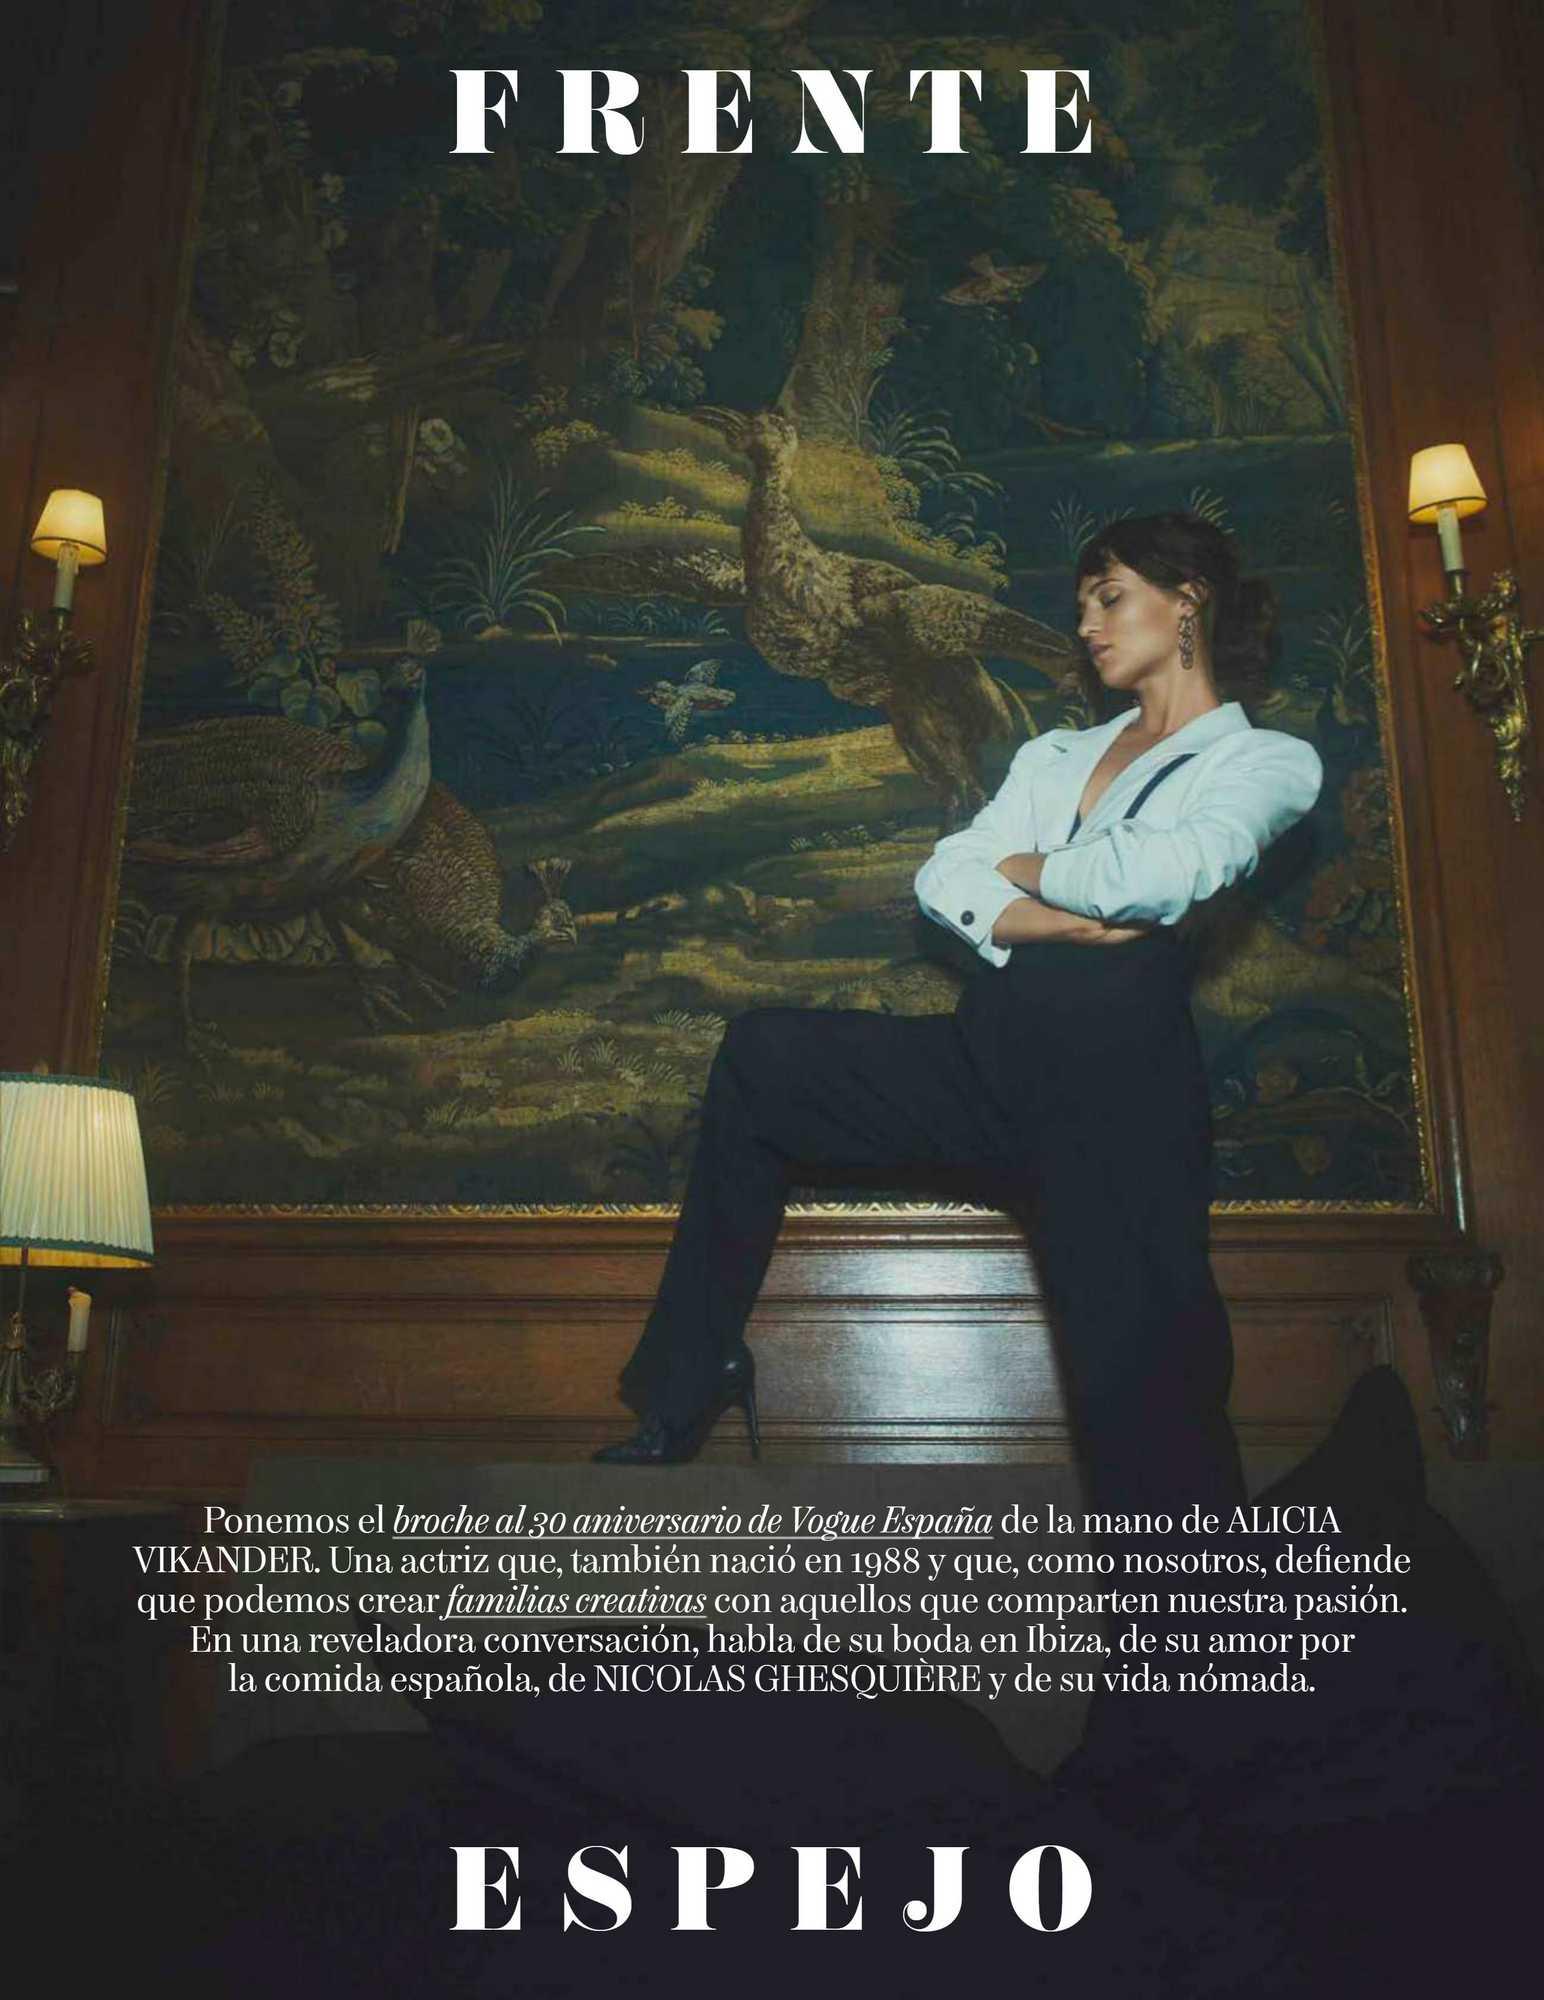 Alicia-Vikander-Vogue-España-December-20186.jpg